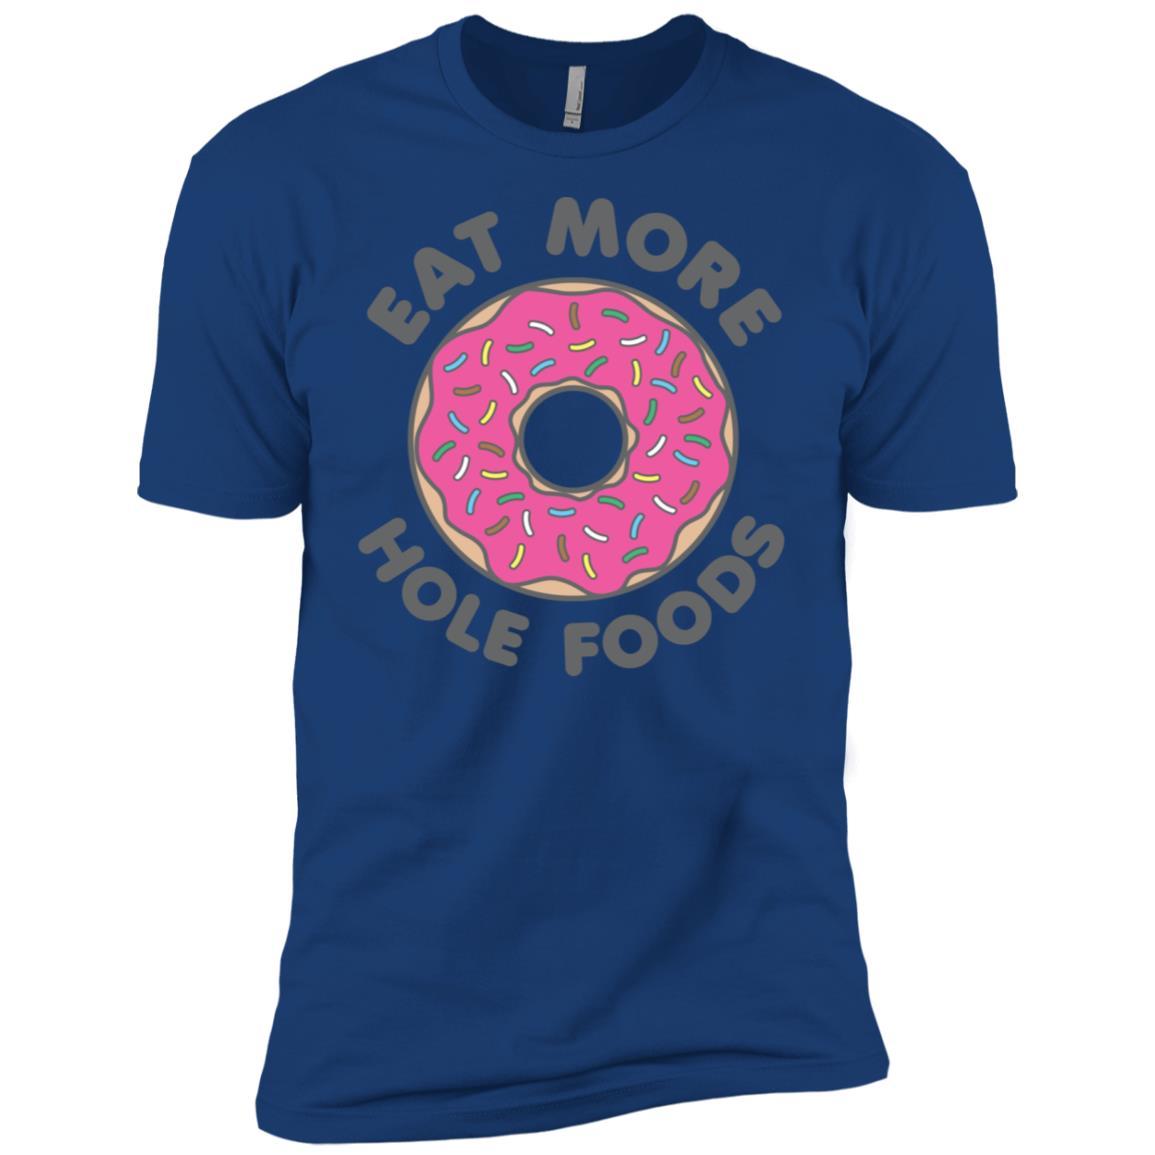 Eat More Hole Foods Donut Strawberry Sprinkles Men Short Sleeve T-Shirt